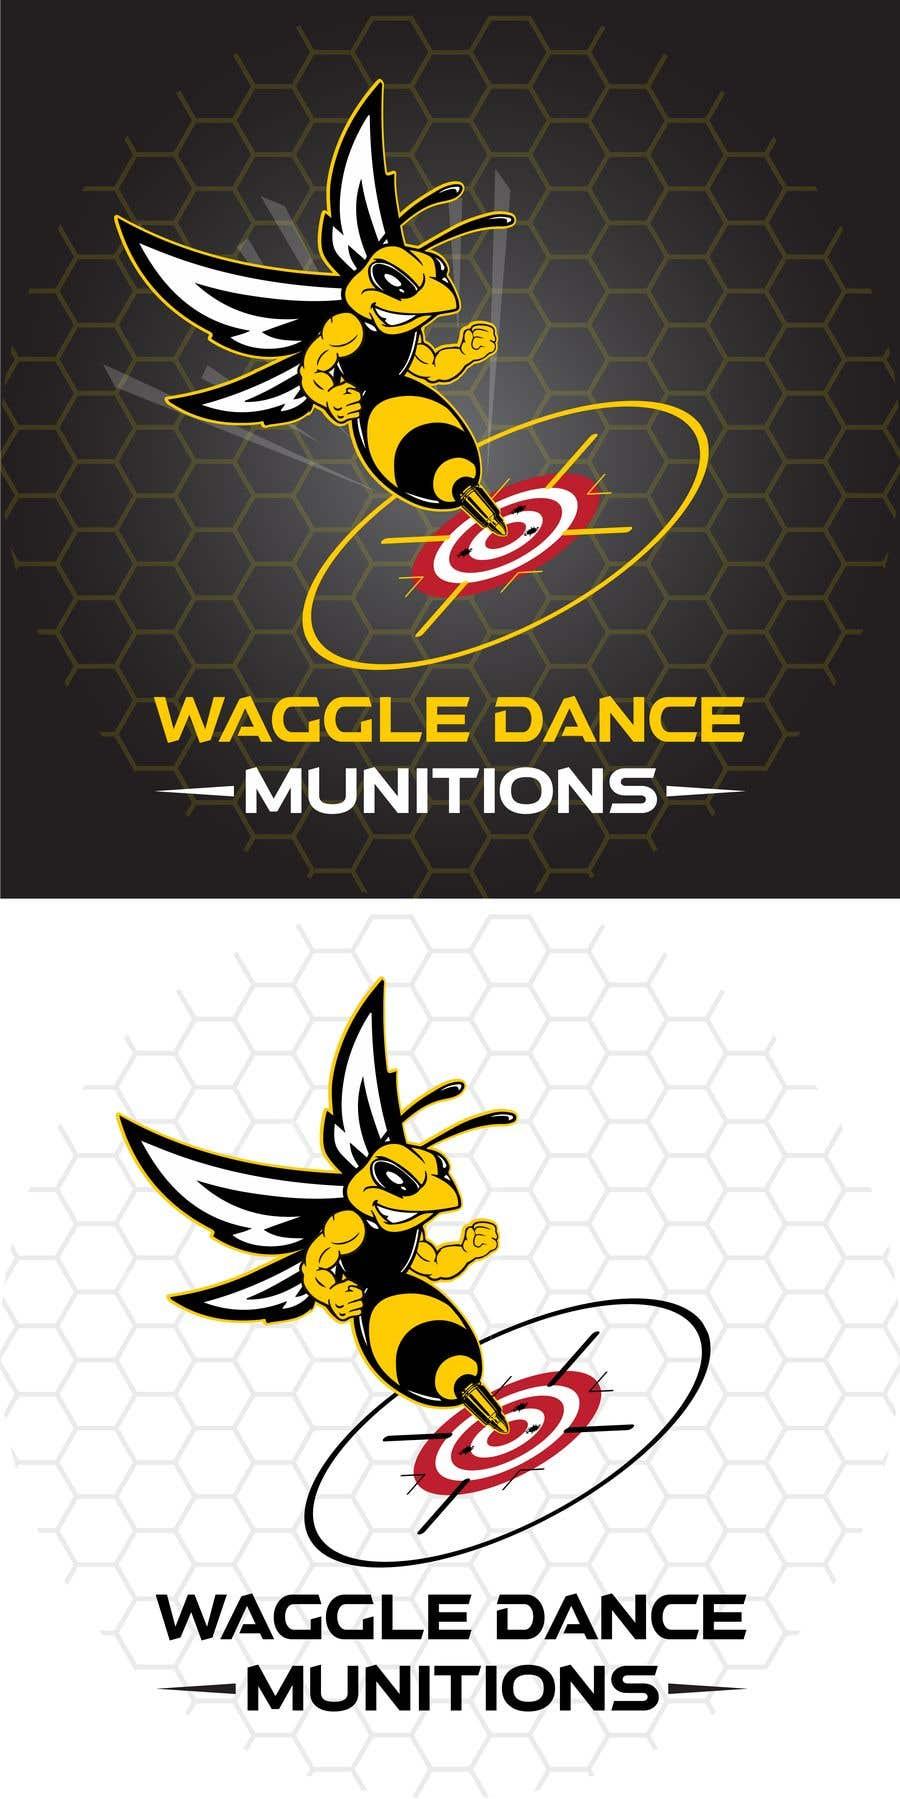 Konkurrenceindlæg #                                        169                                      for                                         Waggle dance logo